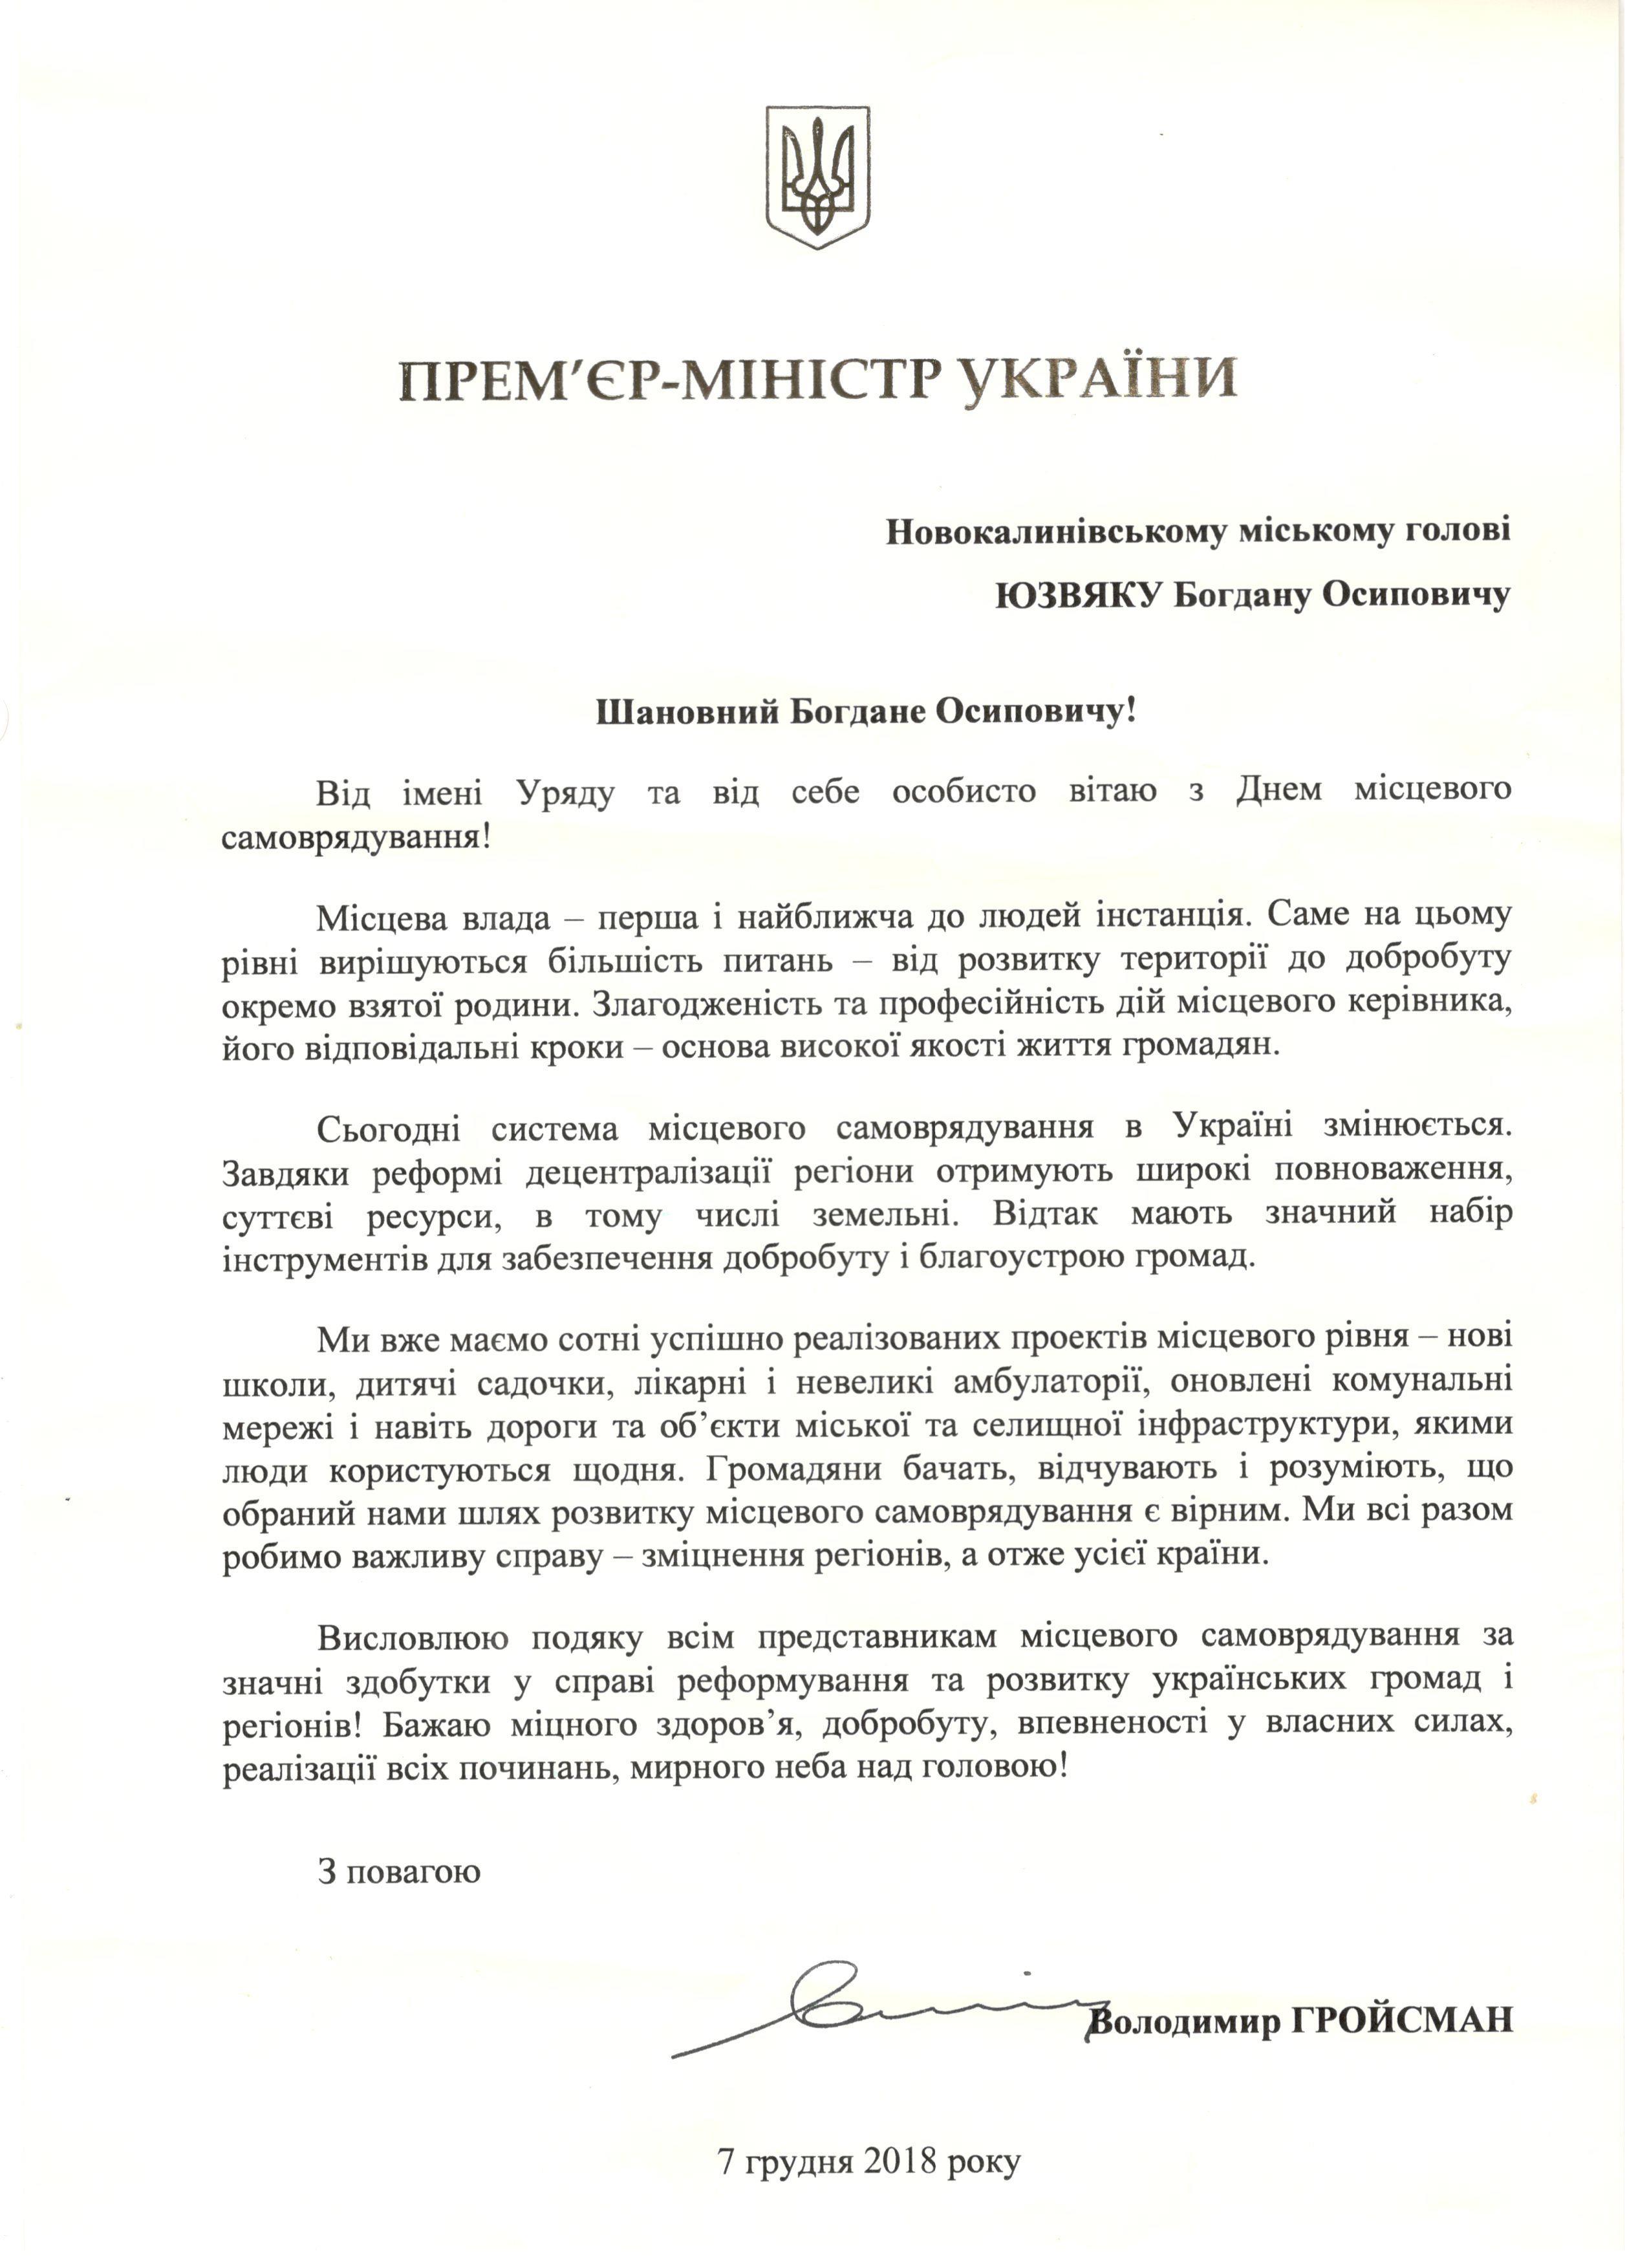 VITANNIa MISKOMU HOLOVI VID PREMIeR-MINISTRA UKRAINY Z DNEM MISTsEVOHO SAMOVRIaDUVANNIa